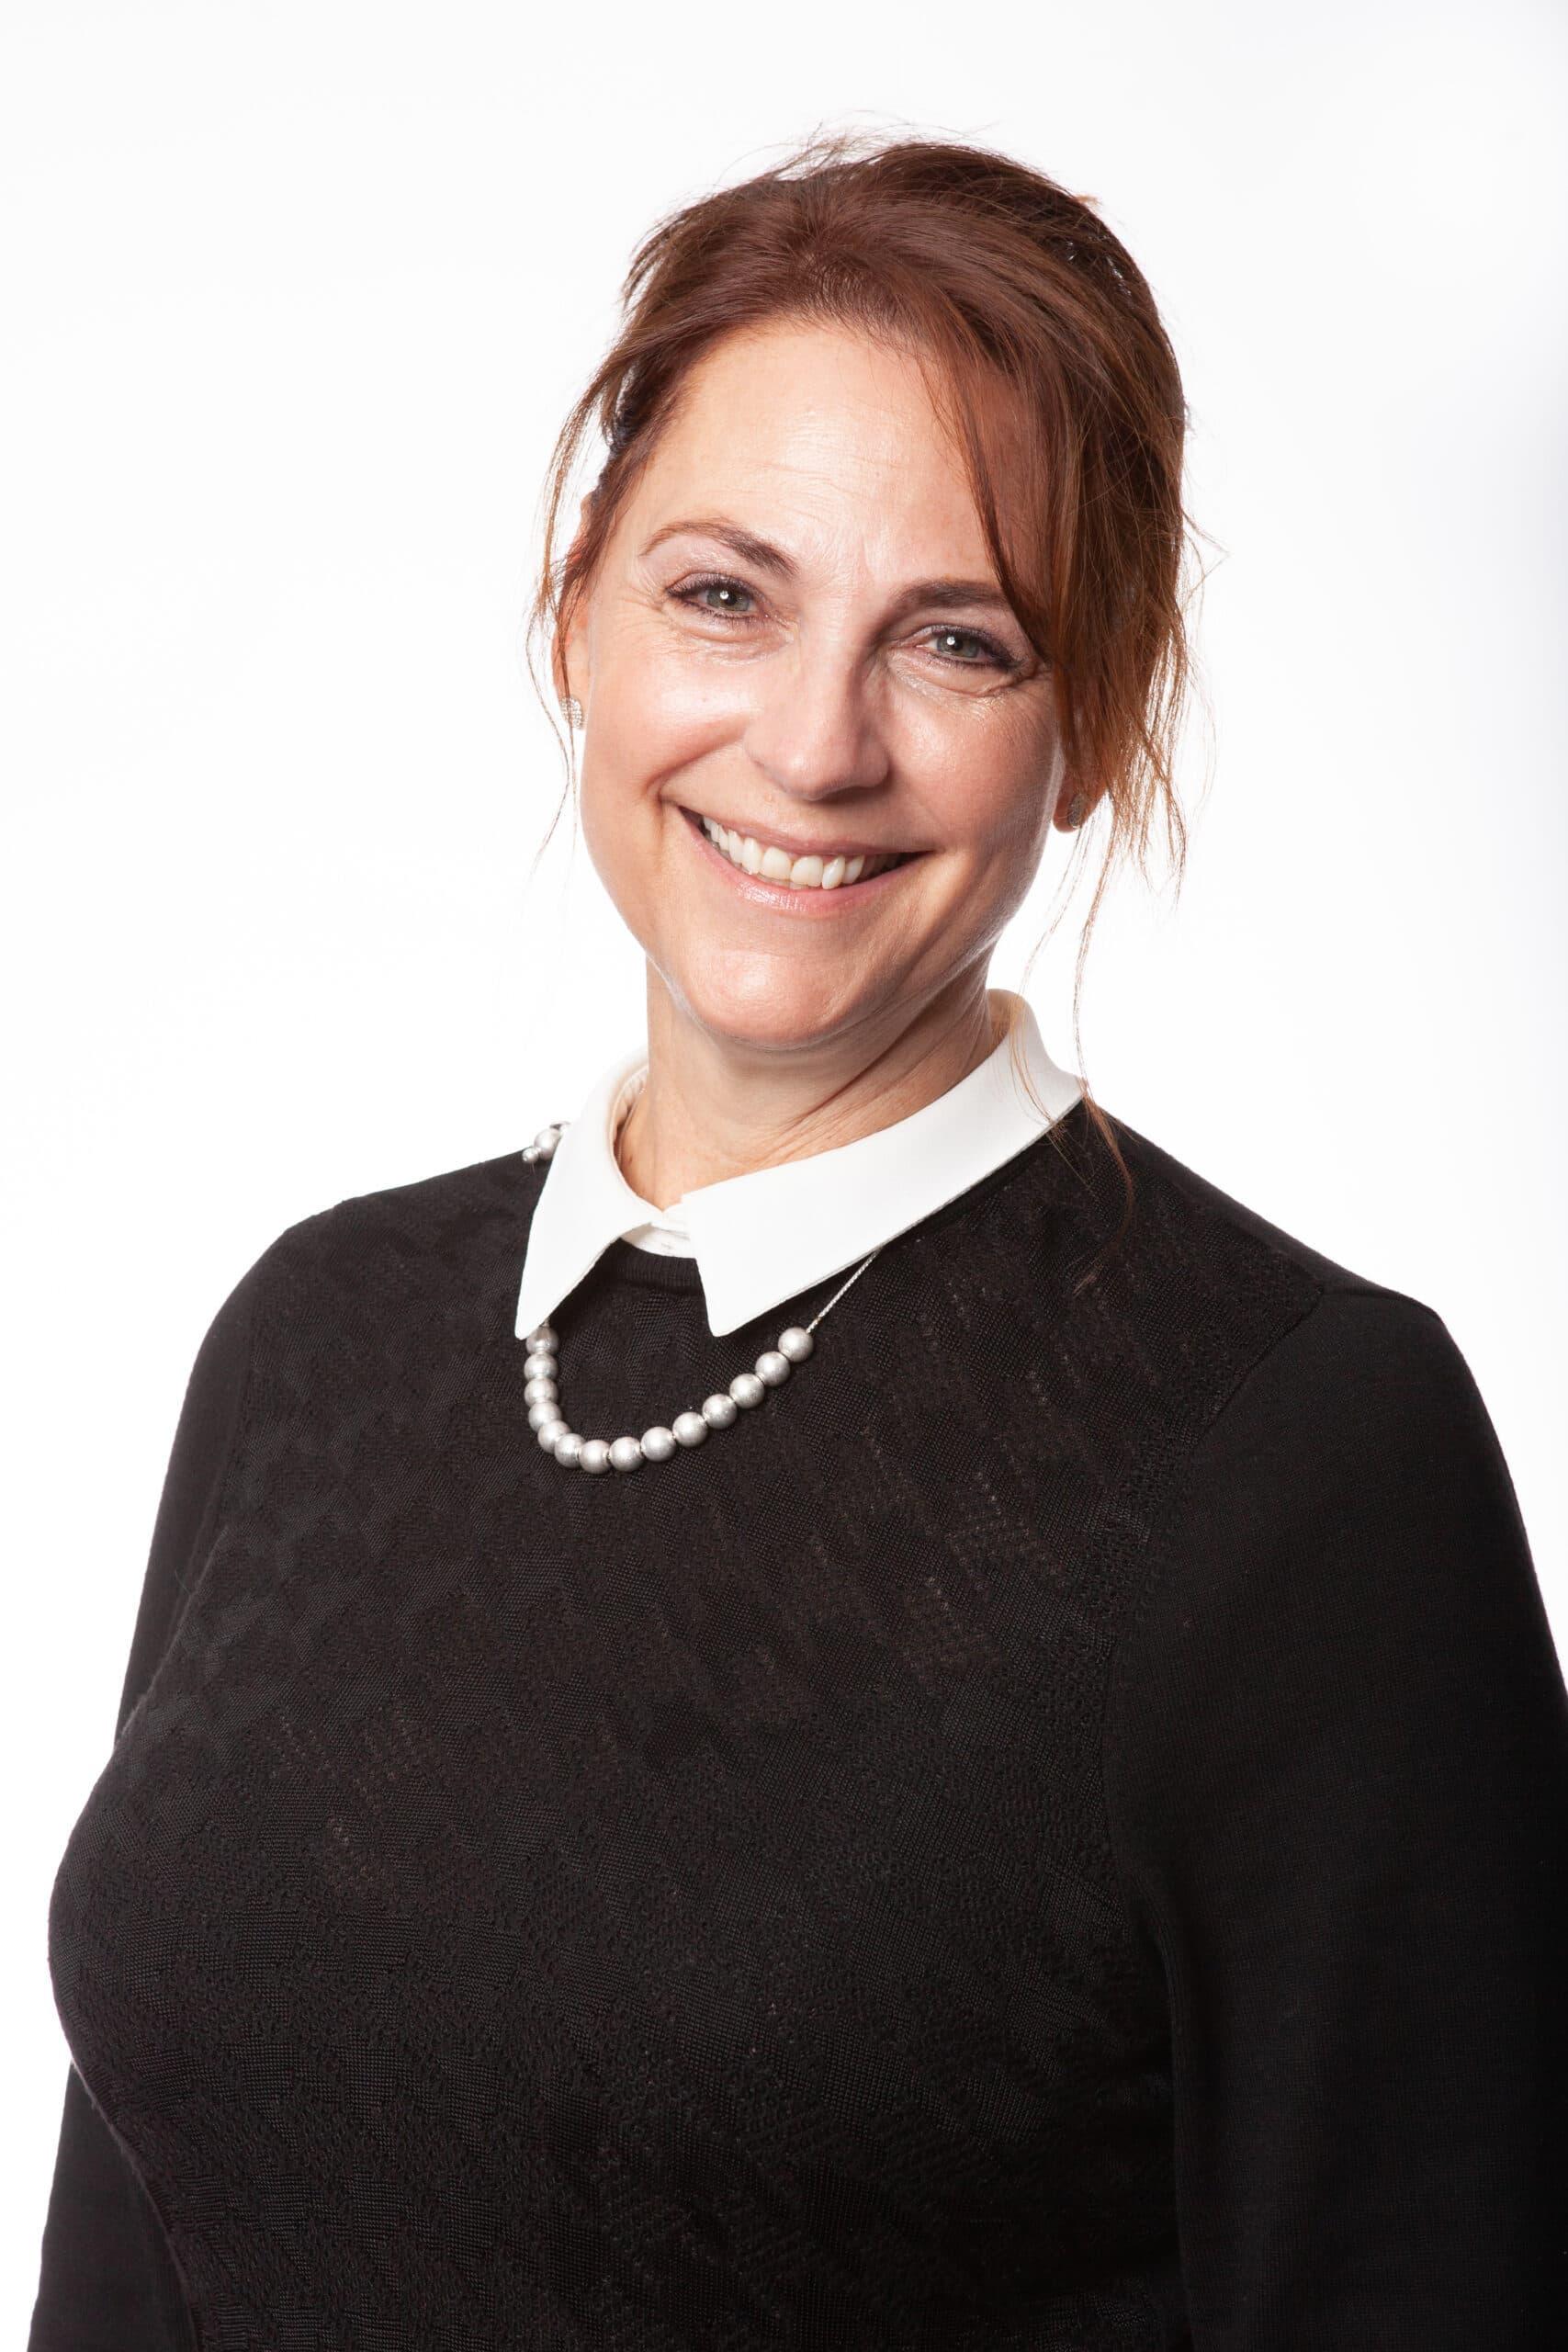 Natalie McKimmey NTP, HLC, EC